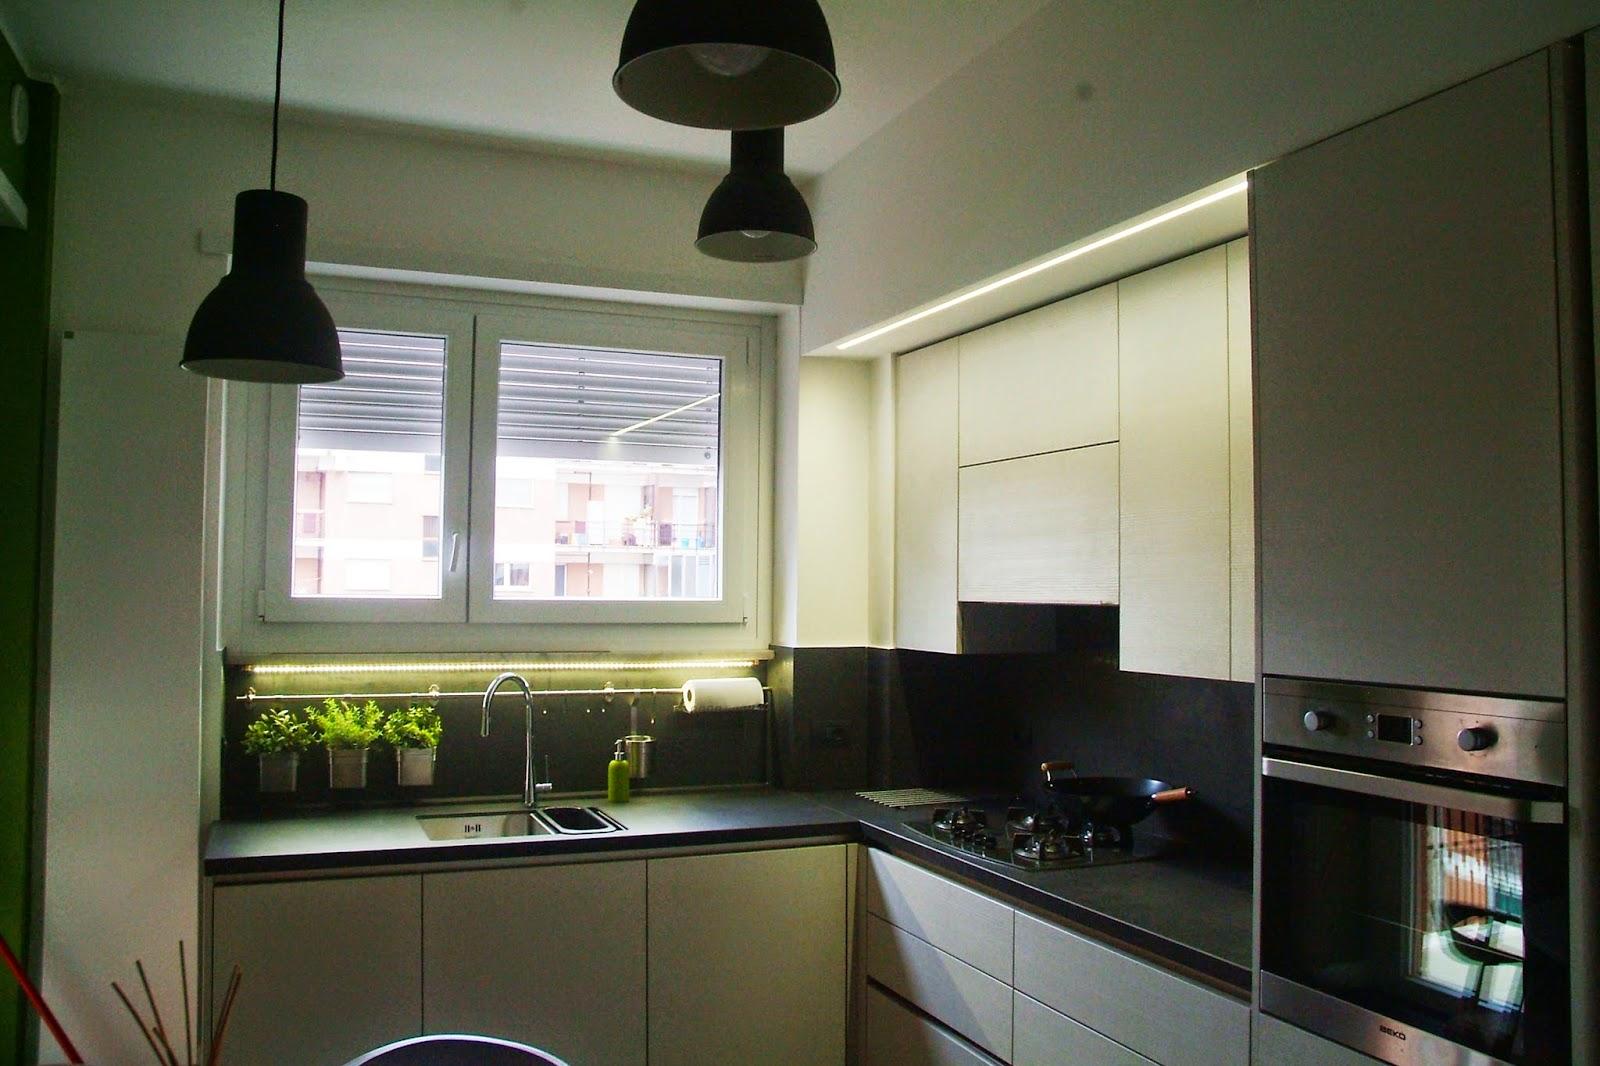 Illuminazione Sottopensile Cucina | Luci Sottopensili Cucina 75 ...